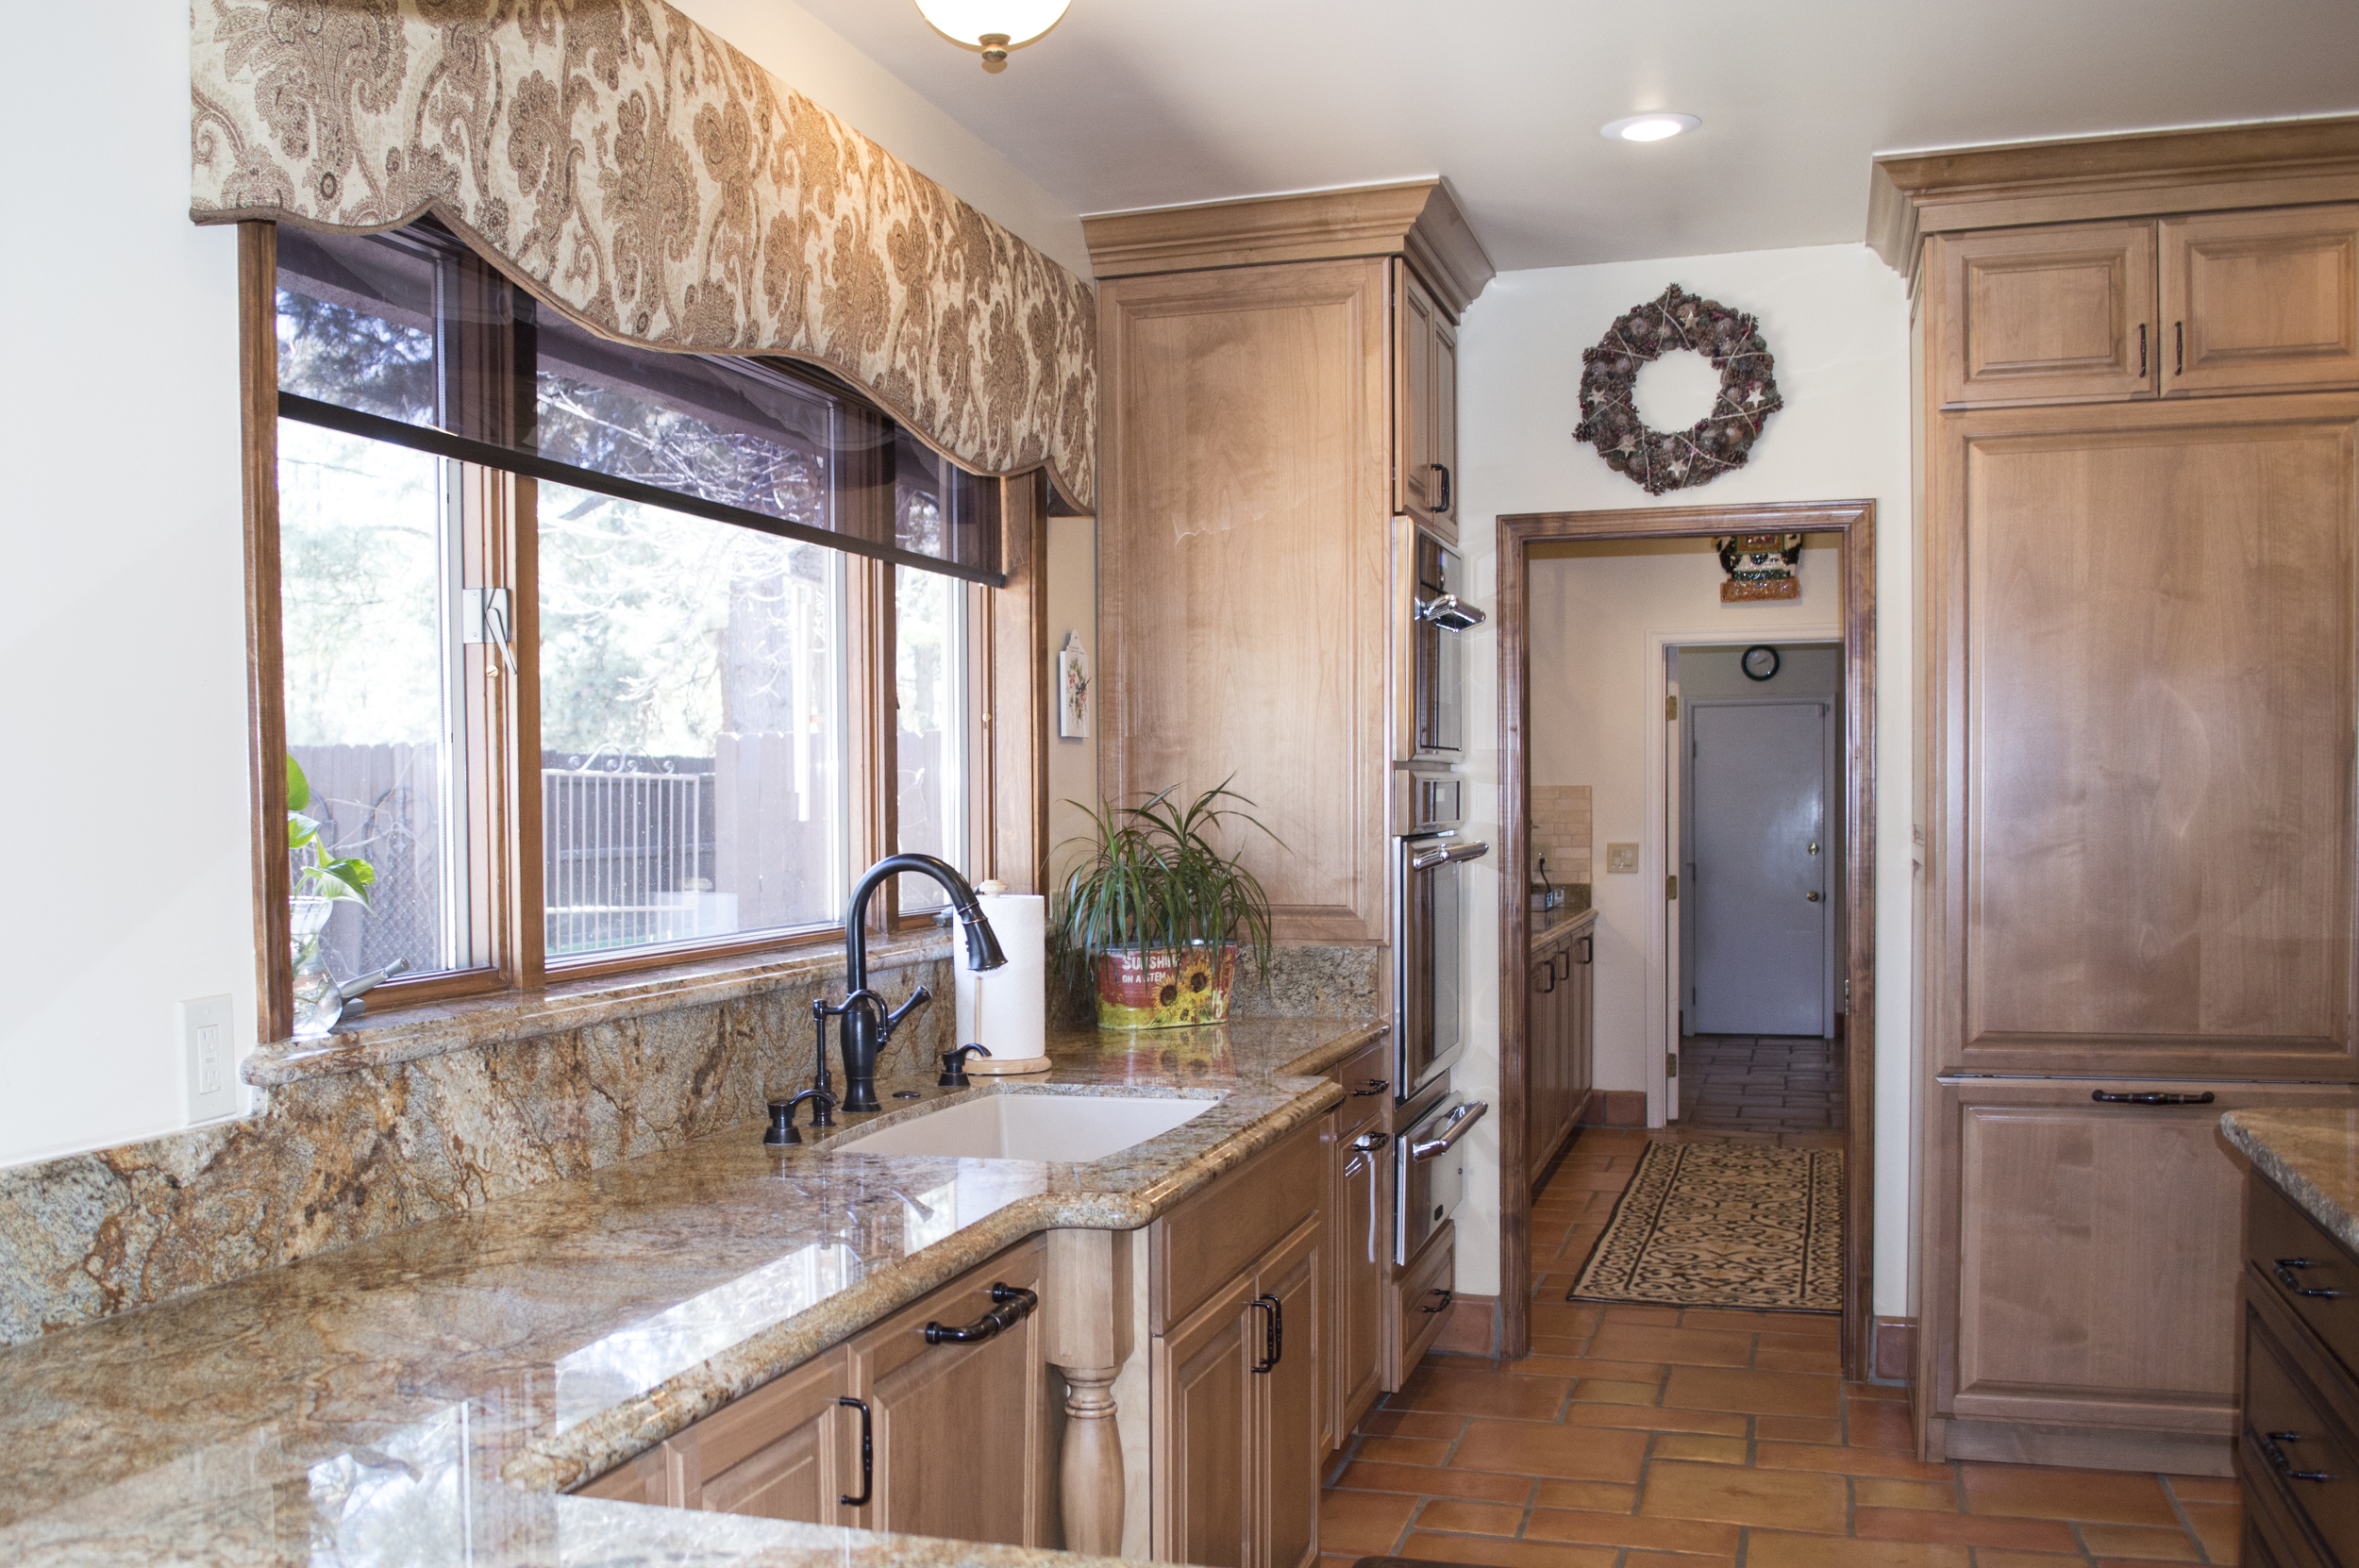 Completed custom bathroom in a residential home near Flagstaff, Arizona.